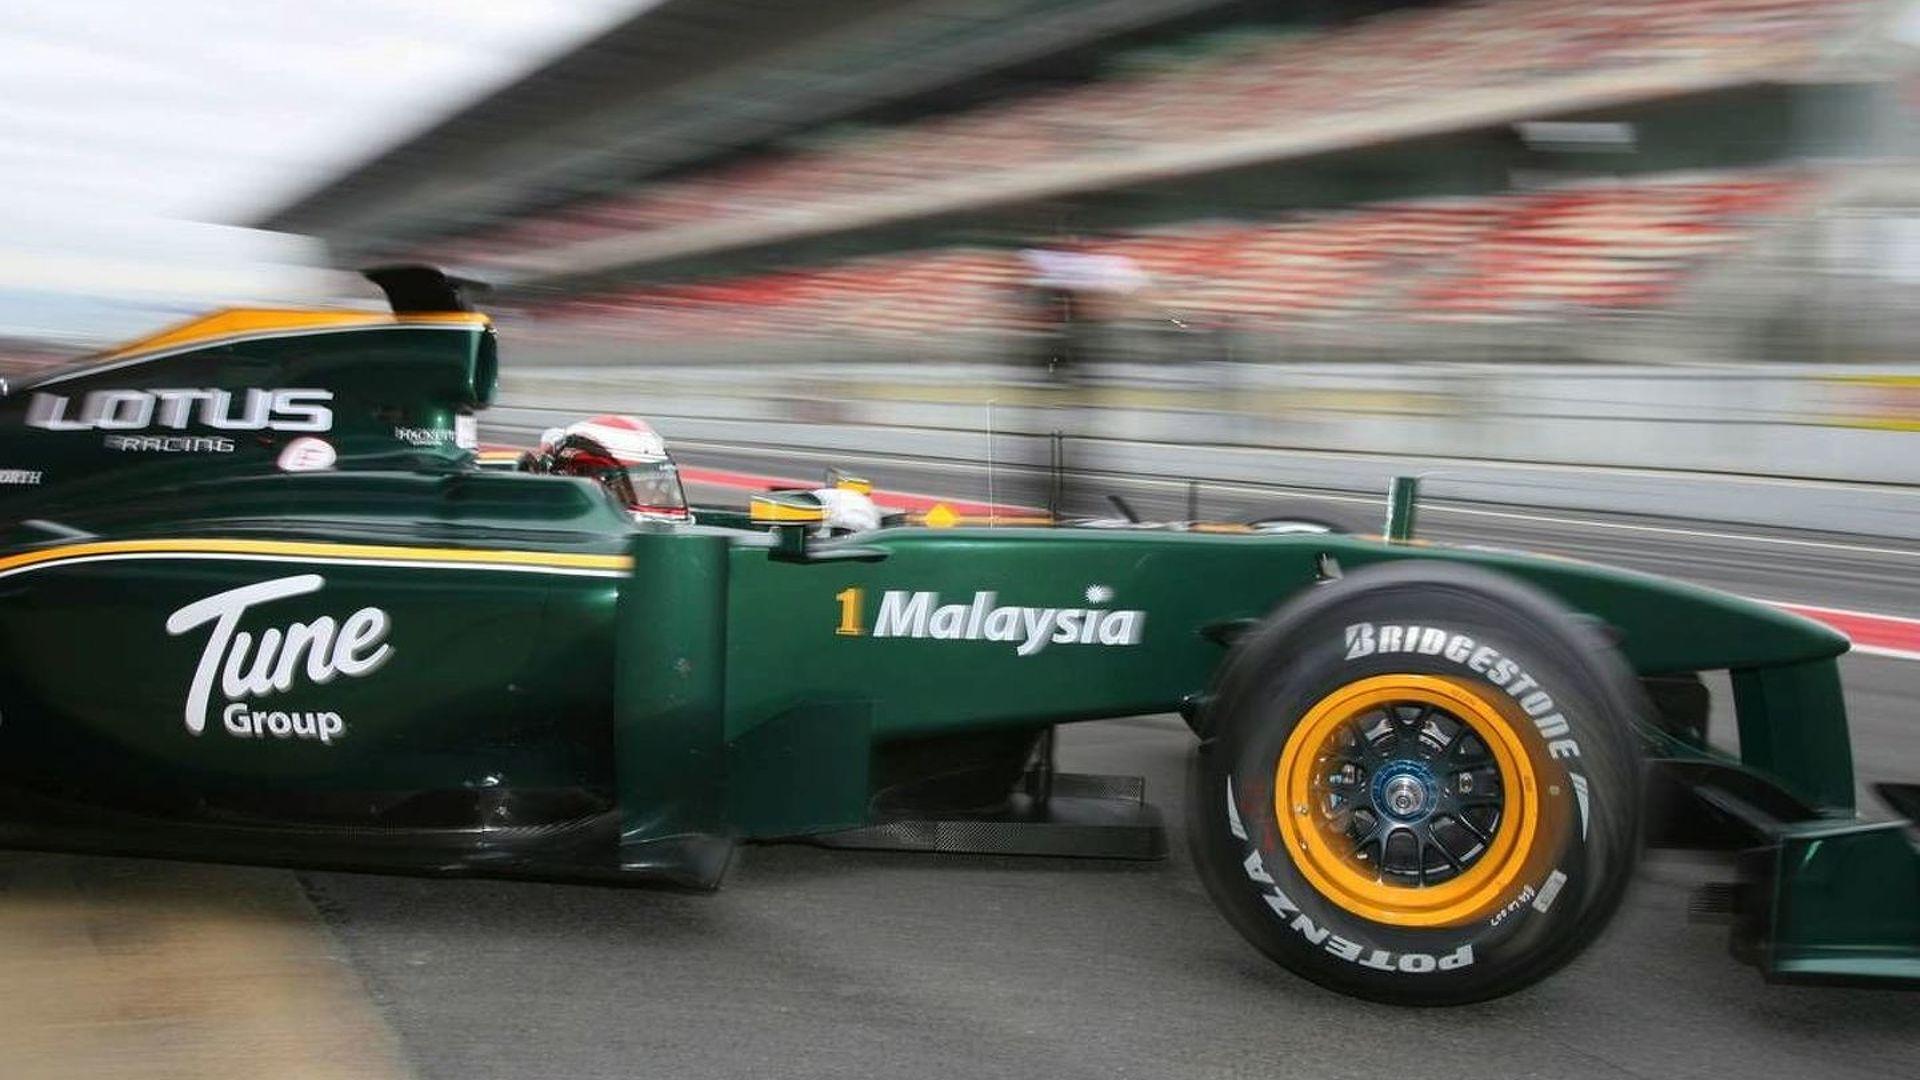 New Lotus car worse than Minardi - Kovalainen